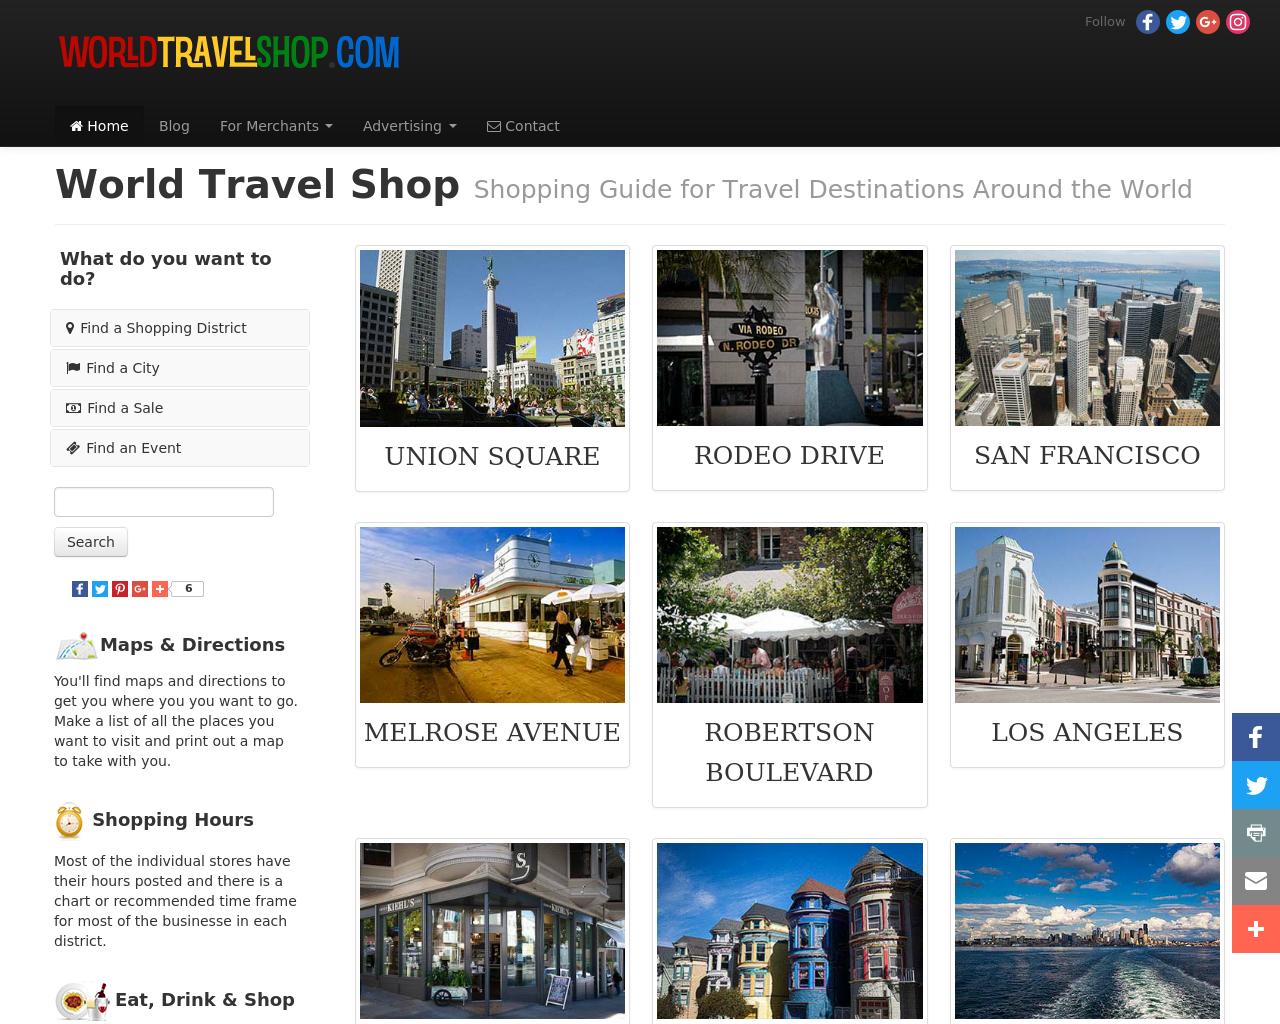 World-Travel-Shop-Melrose-Avenue-Advertising-Reviews-Pricing